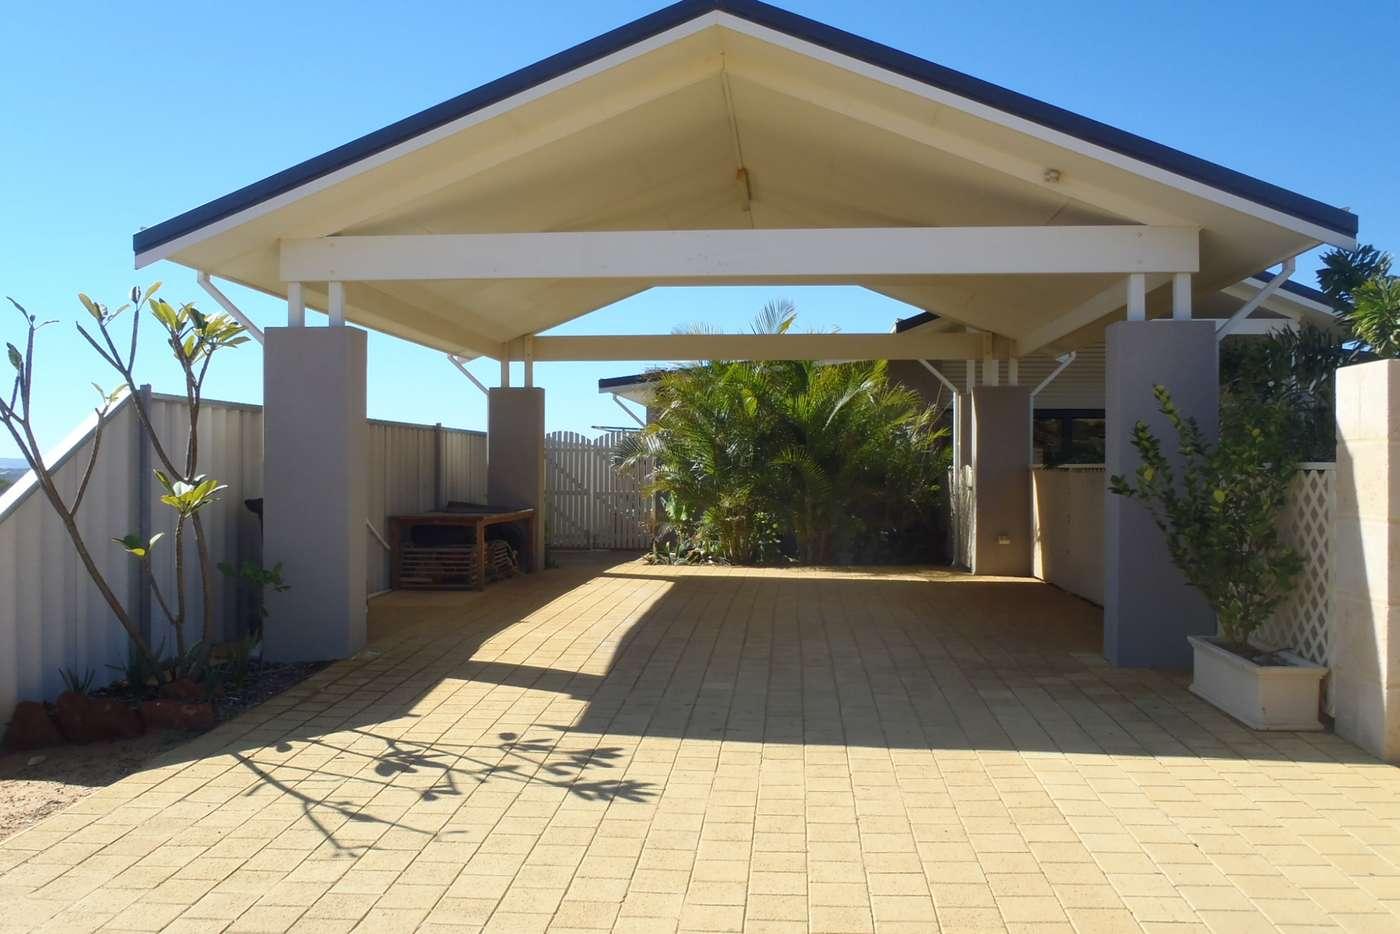 Main view of Homely house listing, 39 Darwinia Drive, Kalbarri WA 6536